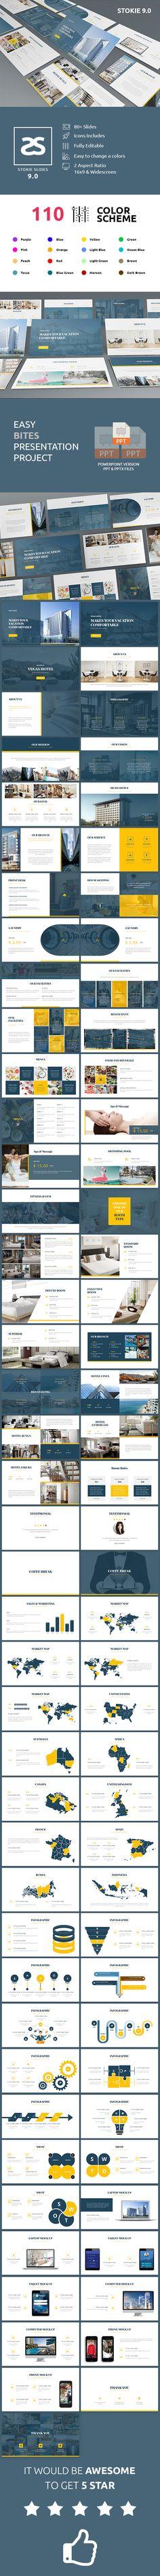 Hotel Vegas Powerpoint Template - Business PowerPoint Templates